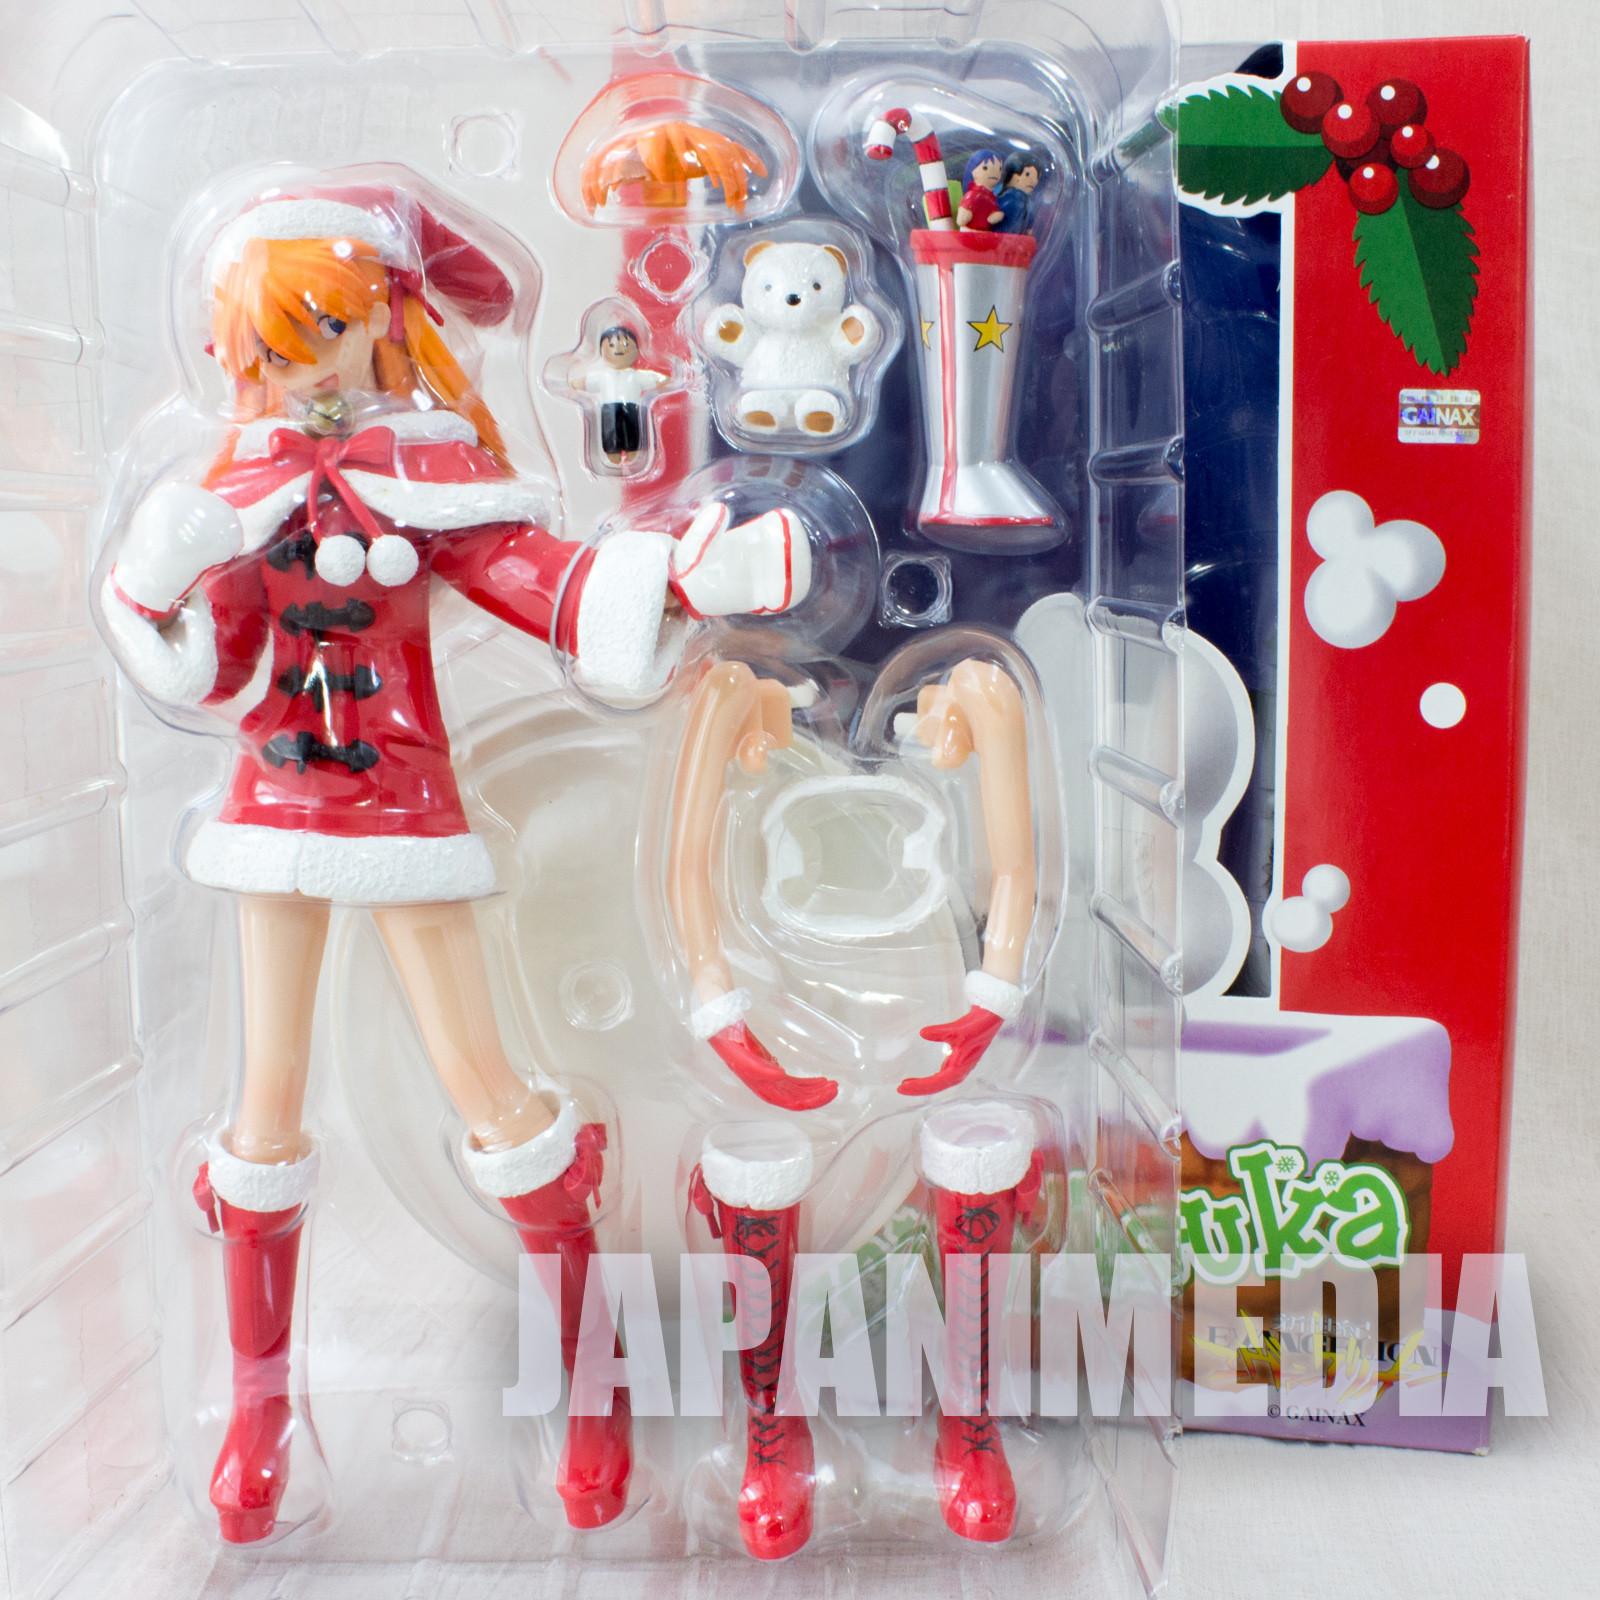 Evangelion Asuka Langley Santa Cosplay Figure Red Ver. JAPAN ANIME